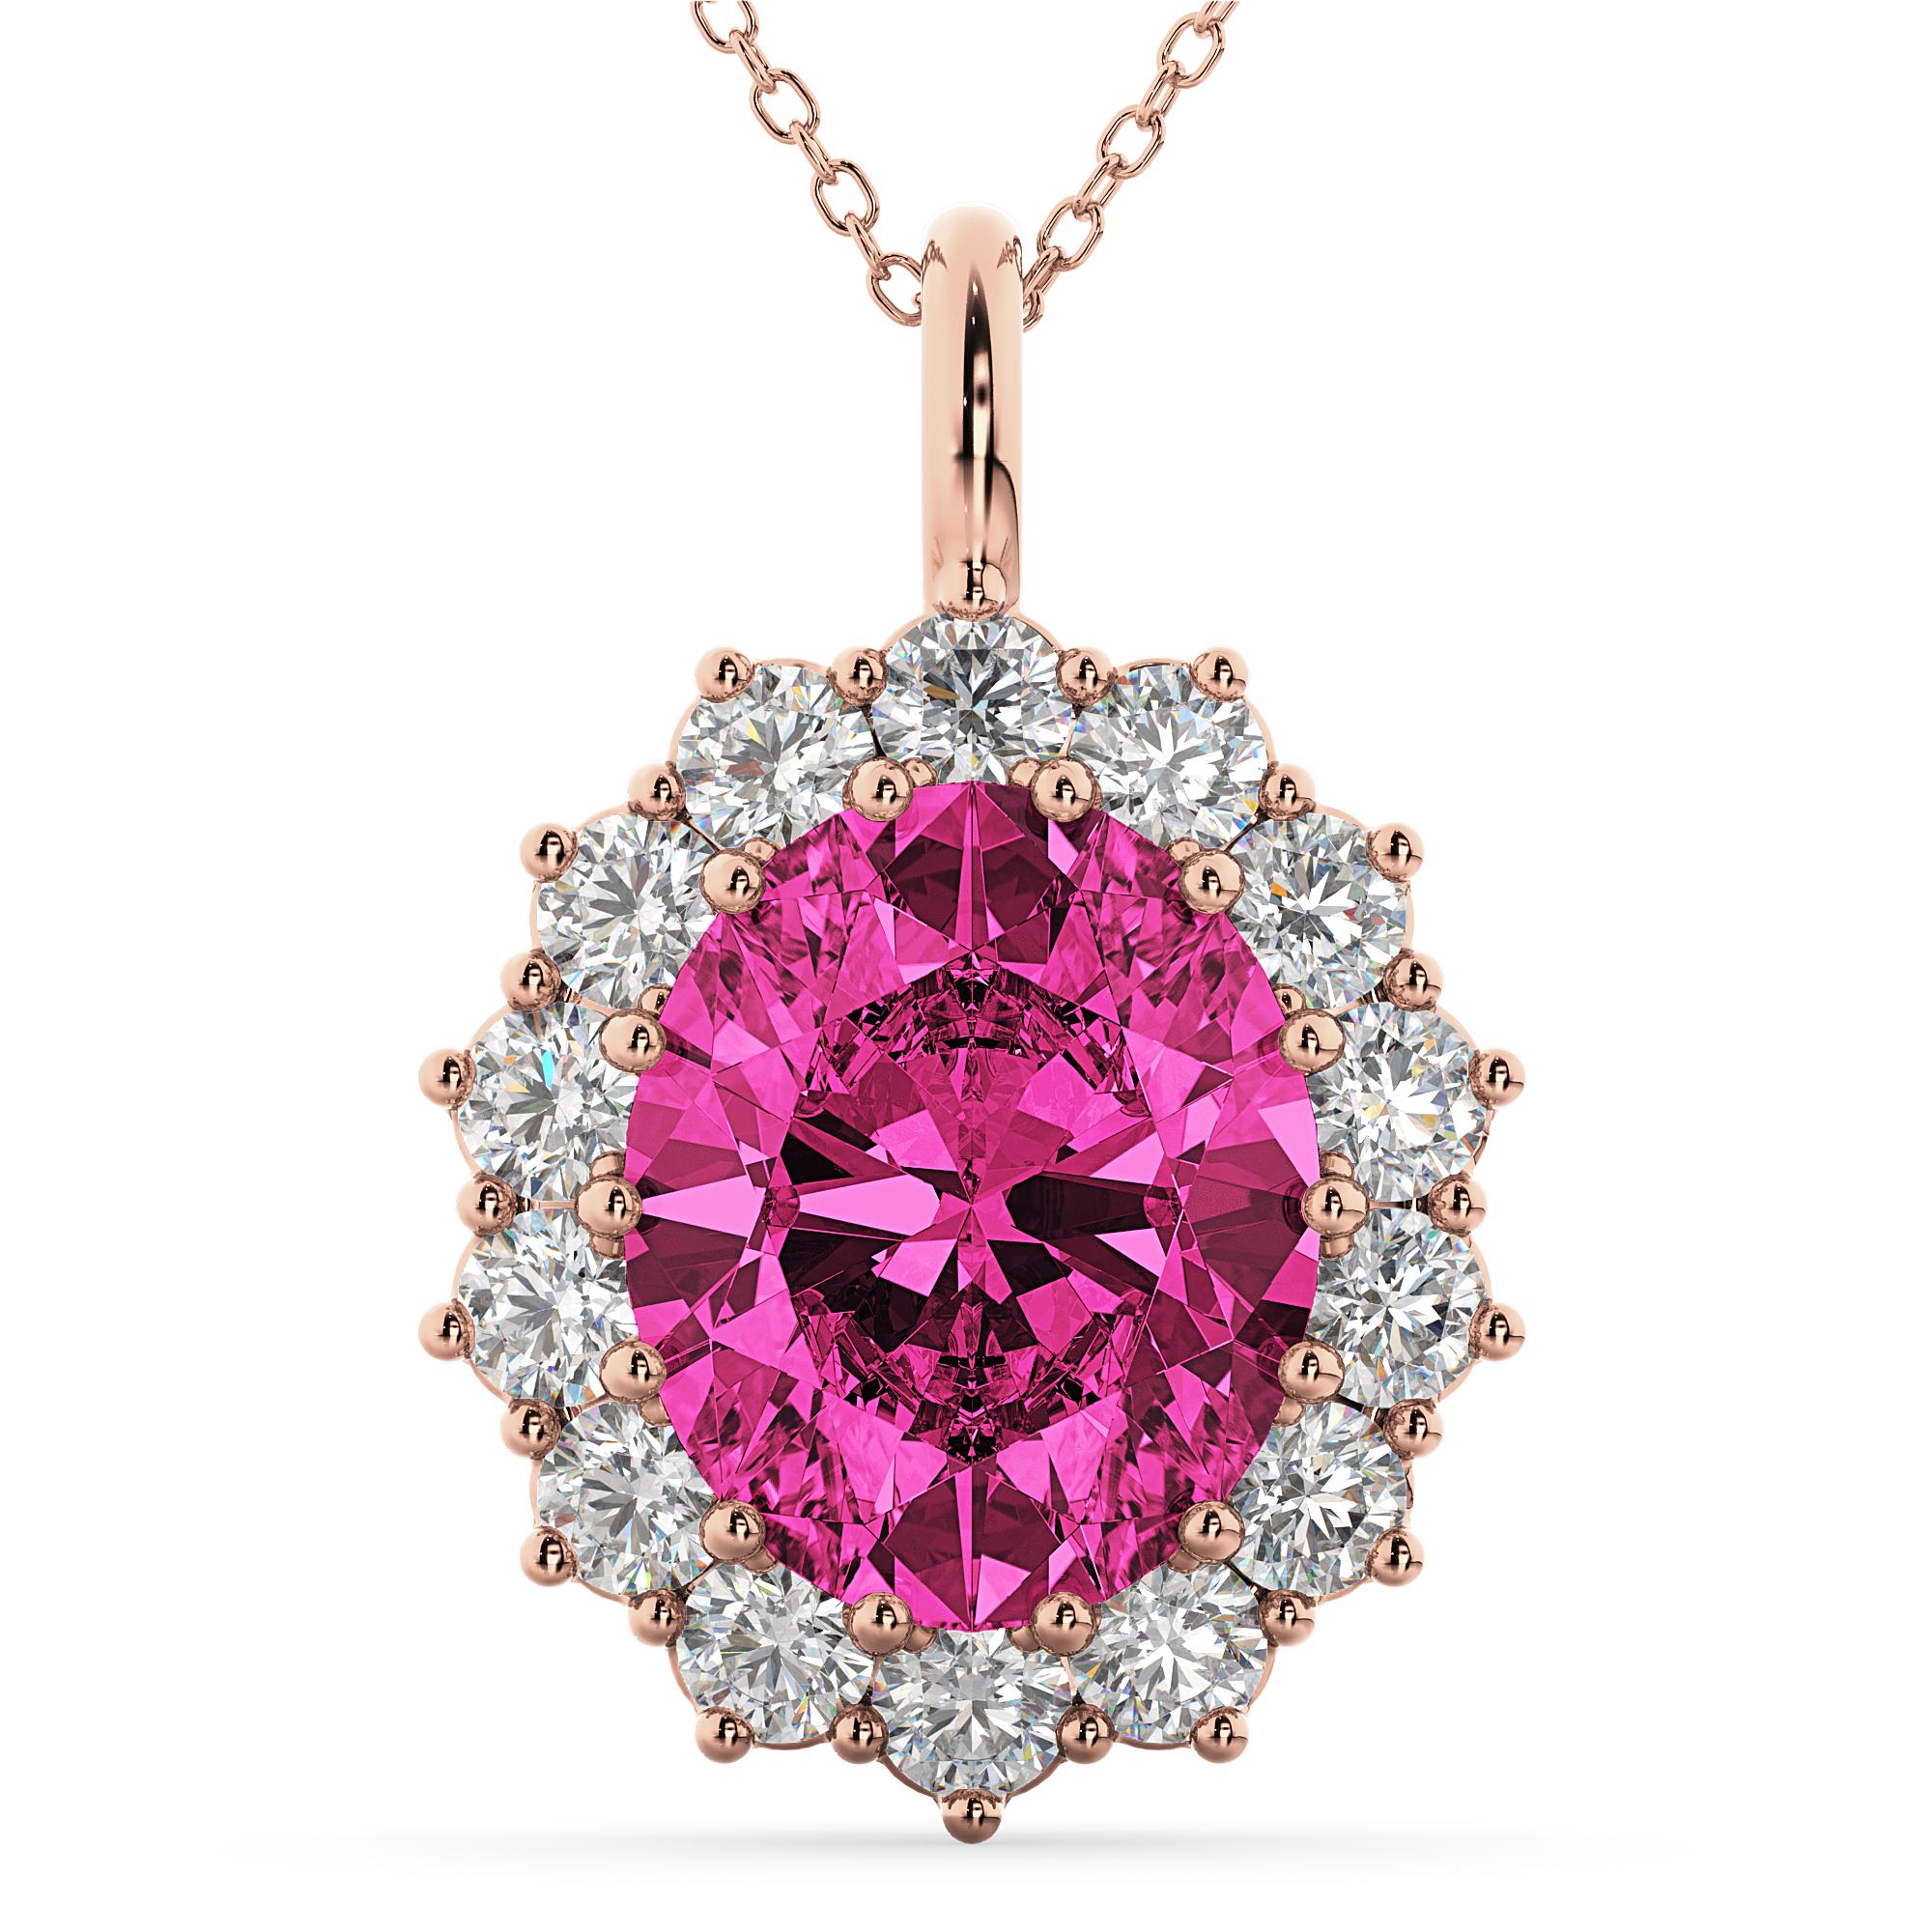 Oval Pink Tourmaline Amp Diamond Halo Pendant Necklace 14k